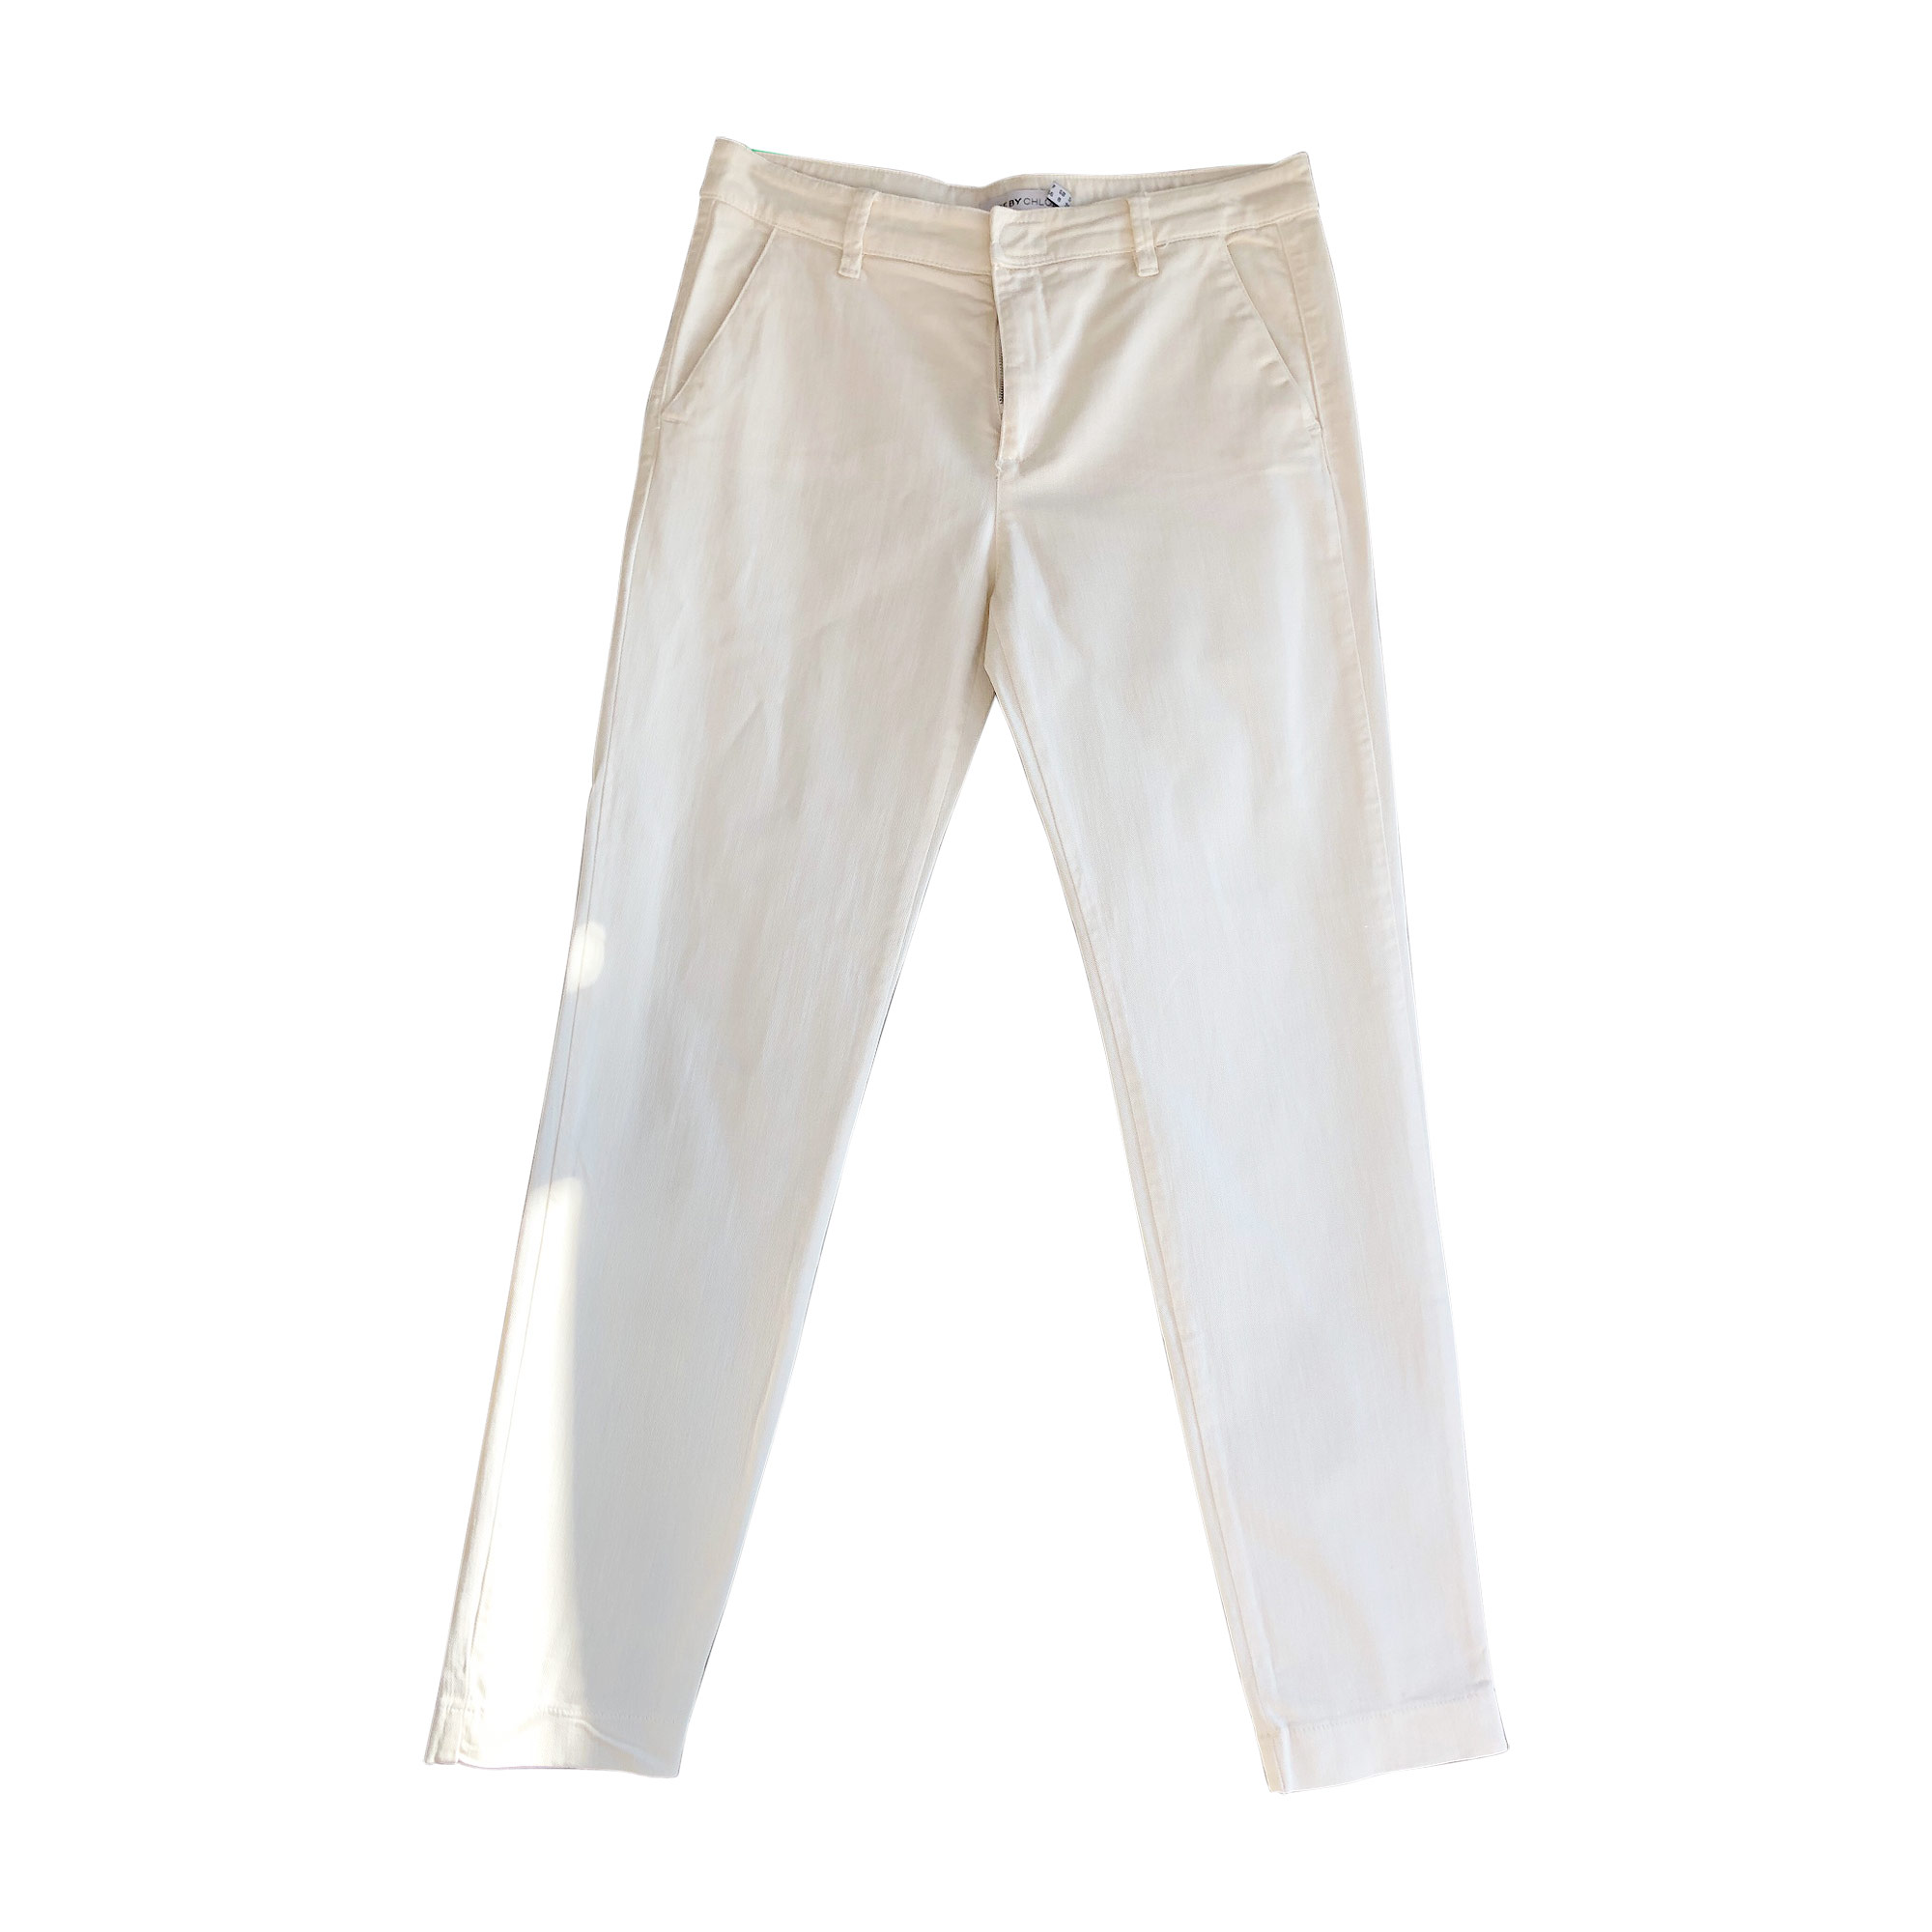 Pantalon slim, cigarette SEE BY CHLOE Blanc, blanc cassé, écru